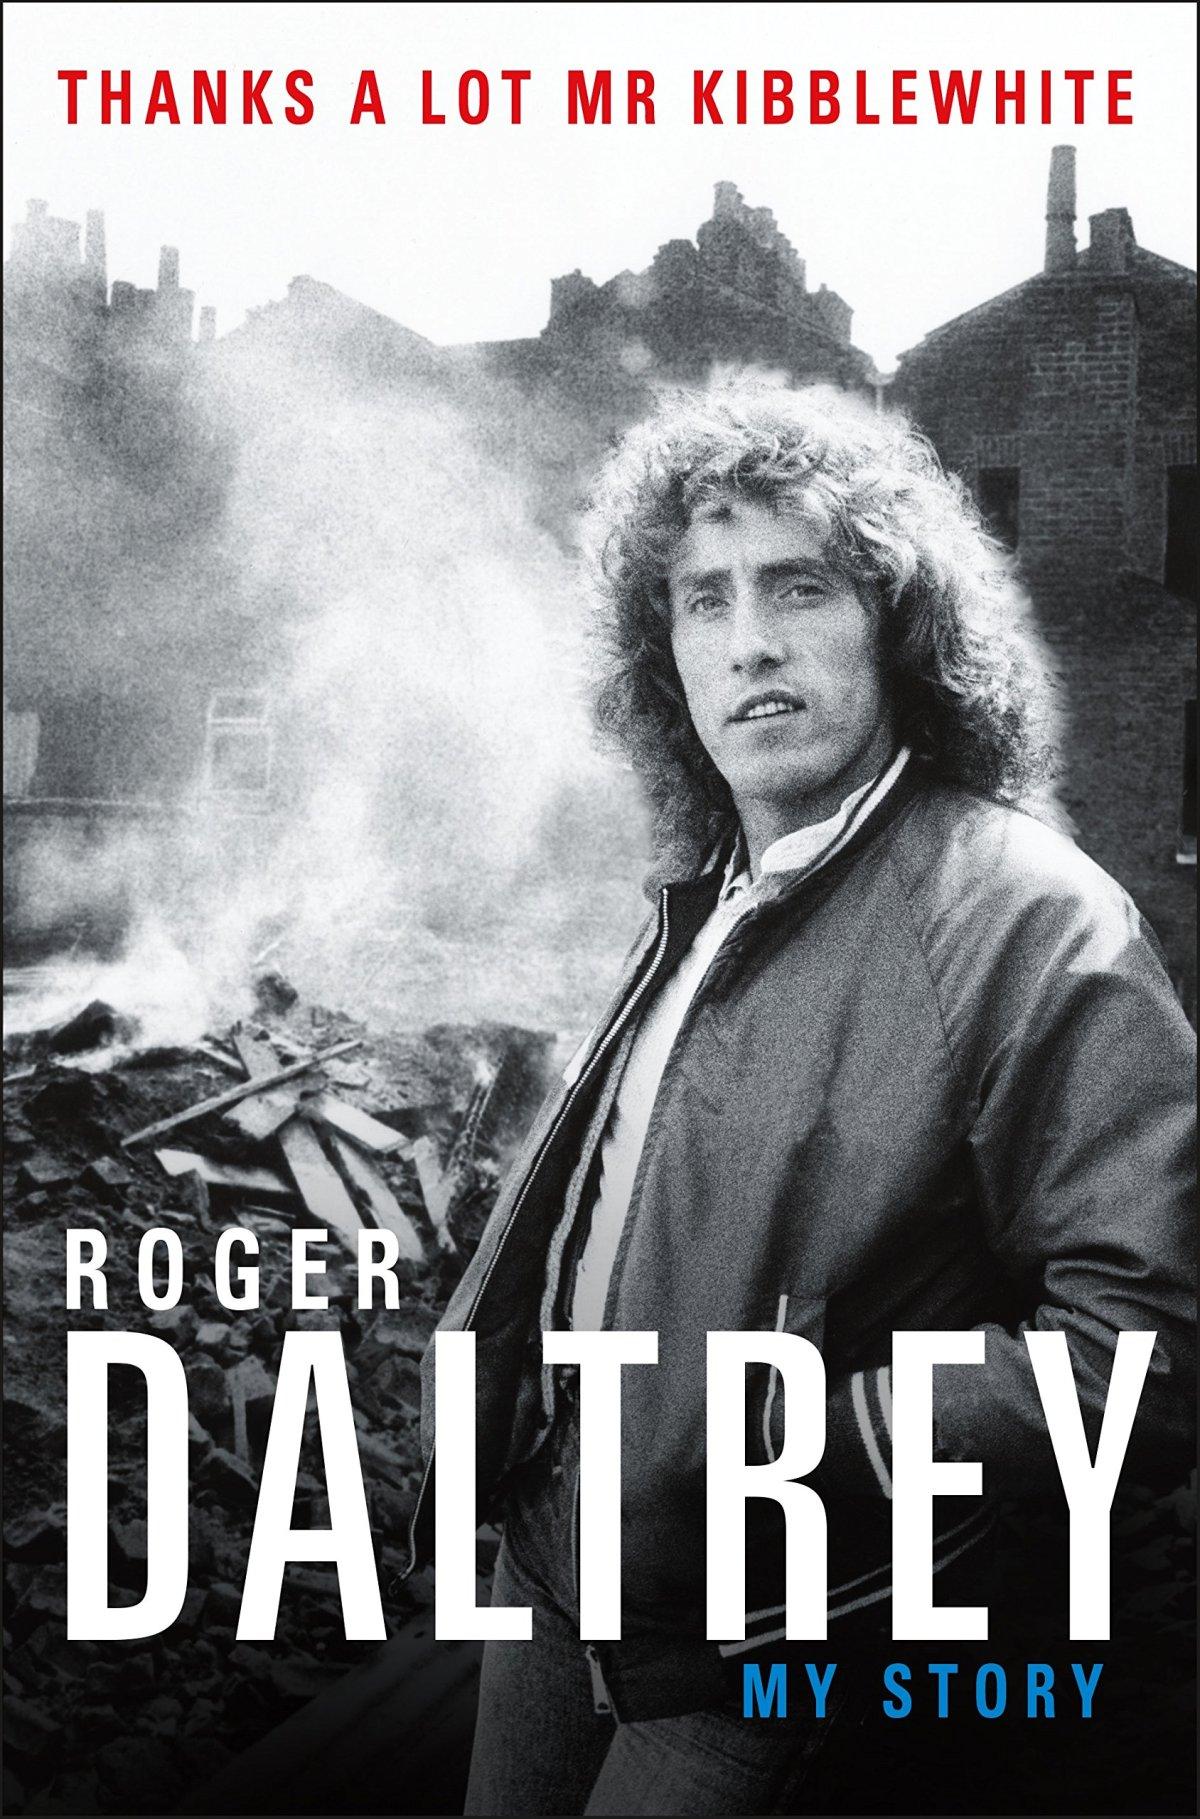 Thanks A Lot Mr. Kibblewhite: My Story RogerDaltrey